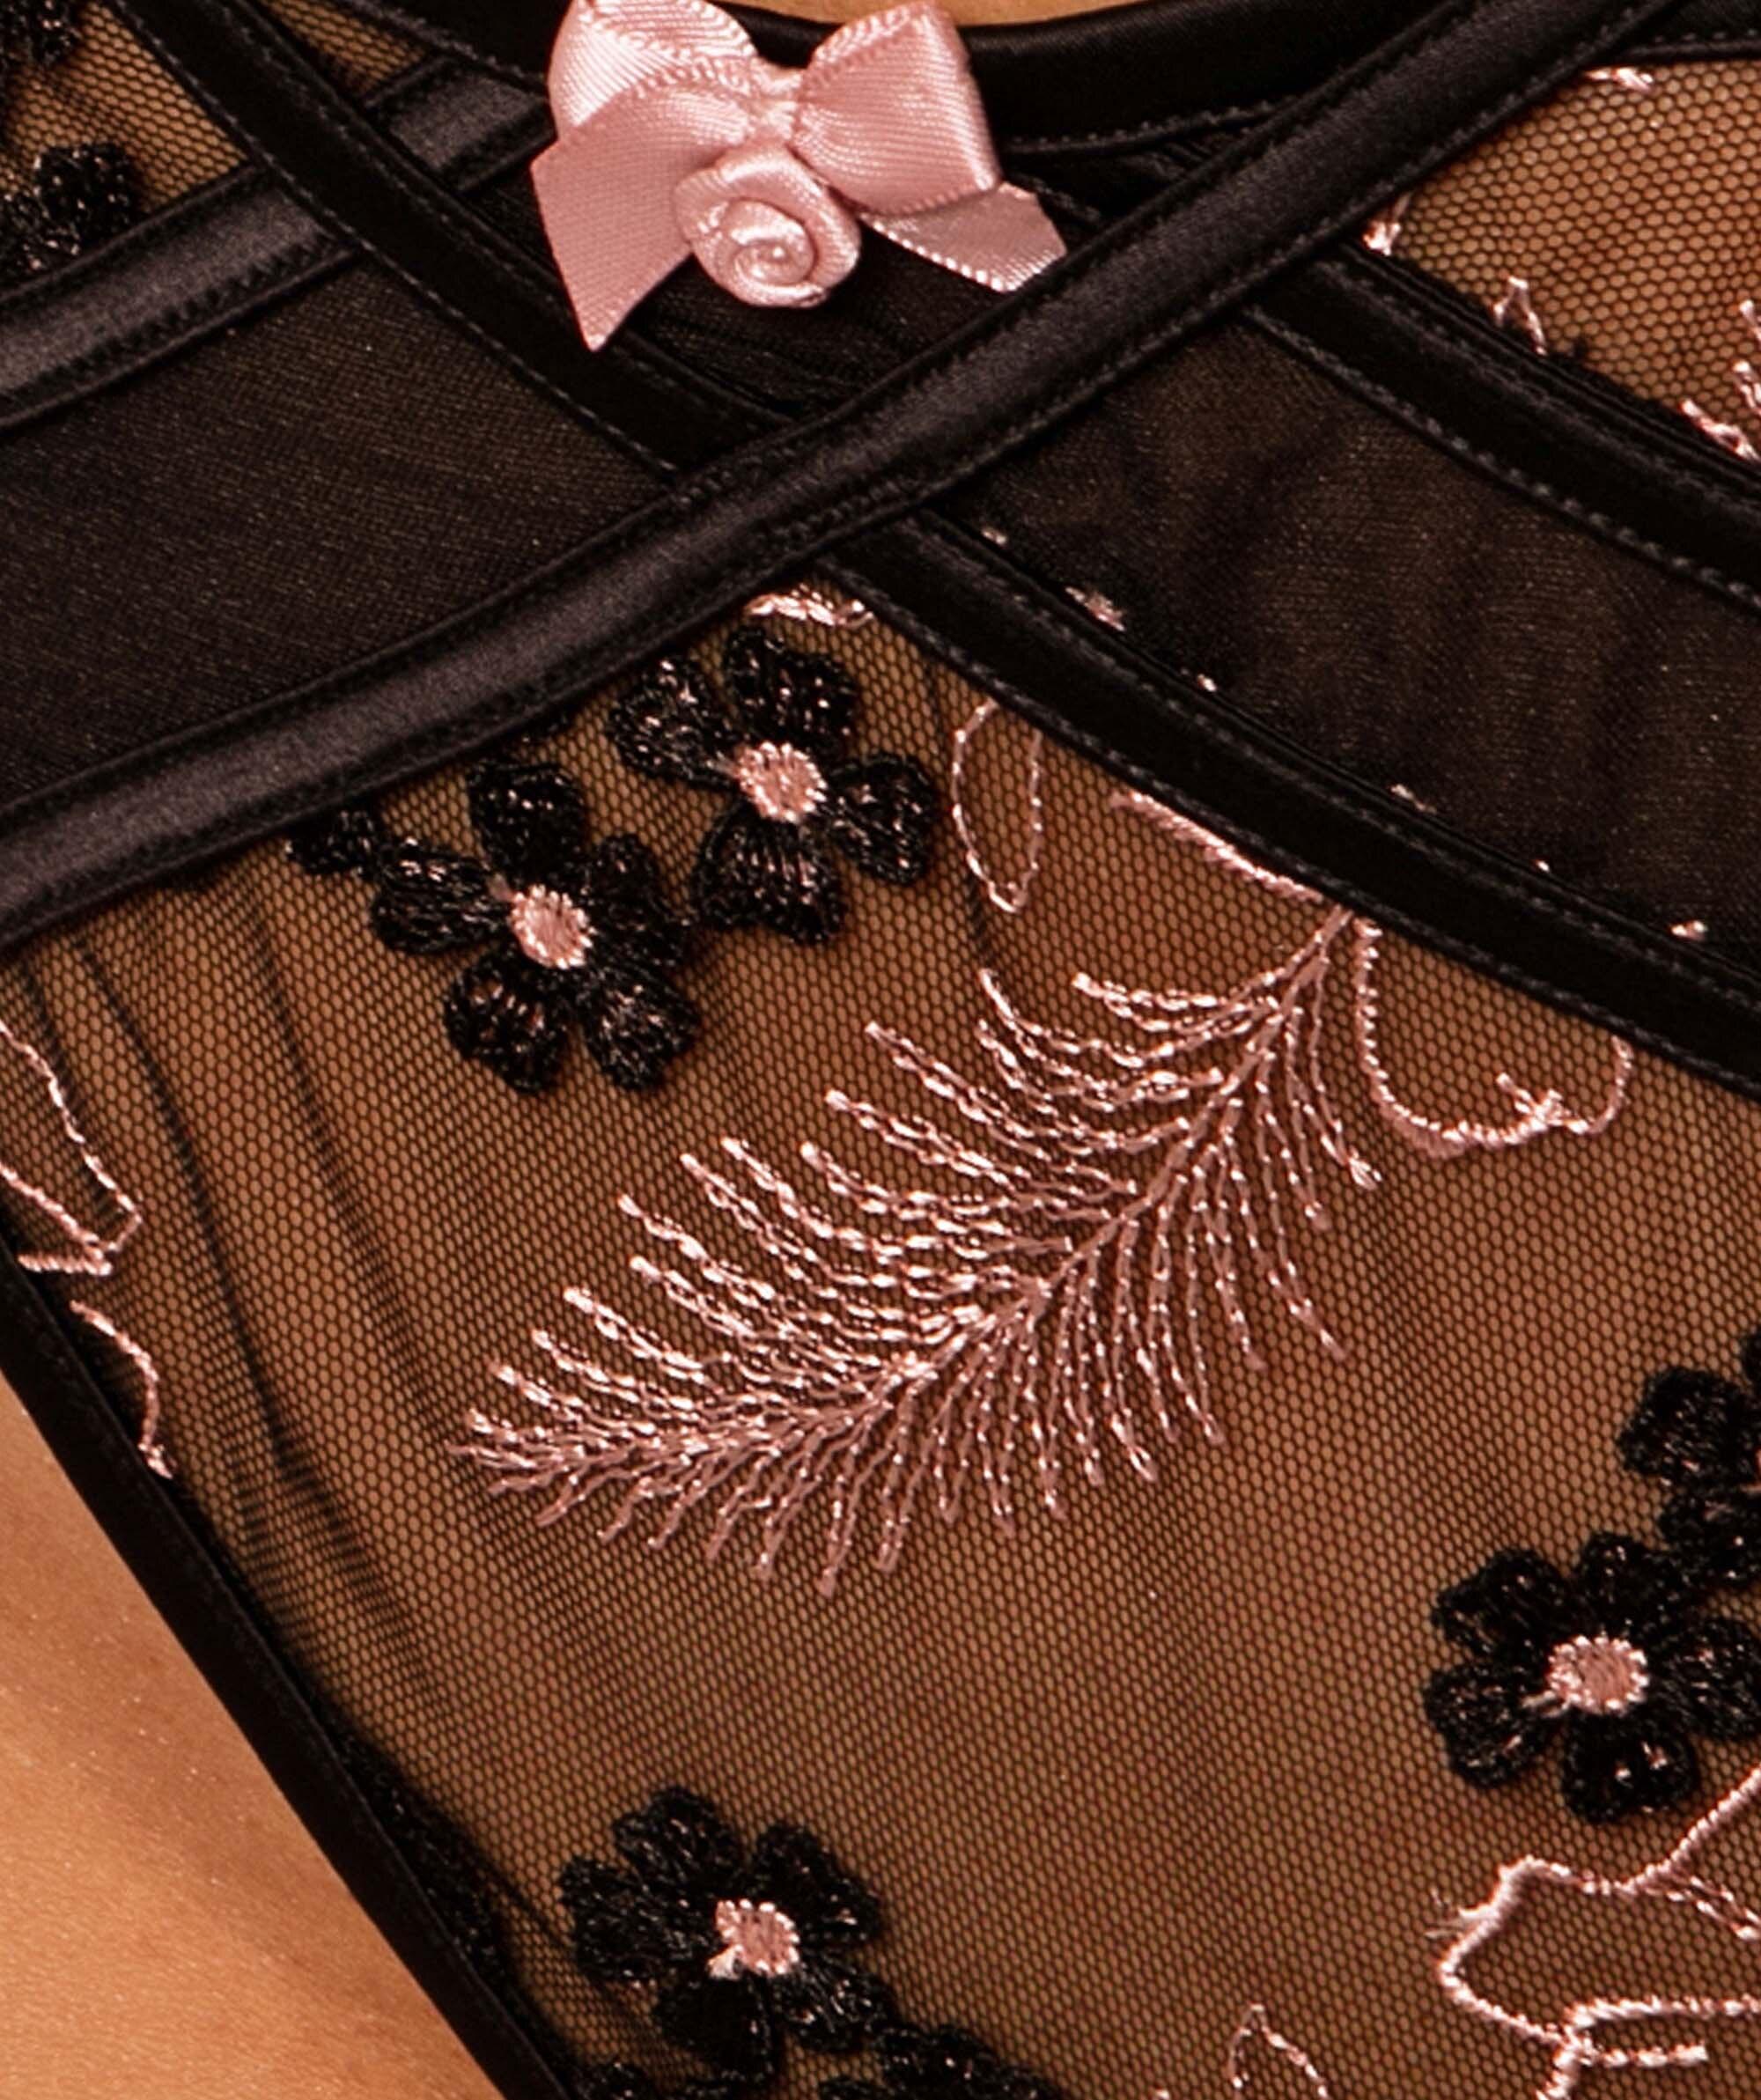 Enchanted Orleans Mini V Knicker - Black/Rose Gold